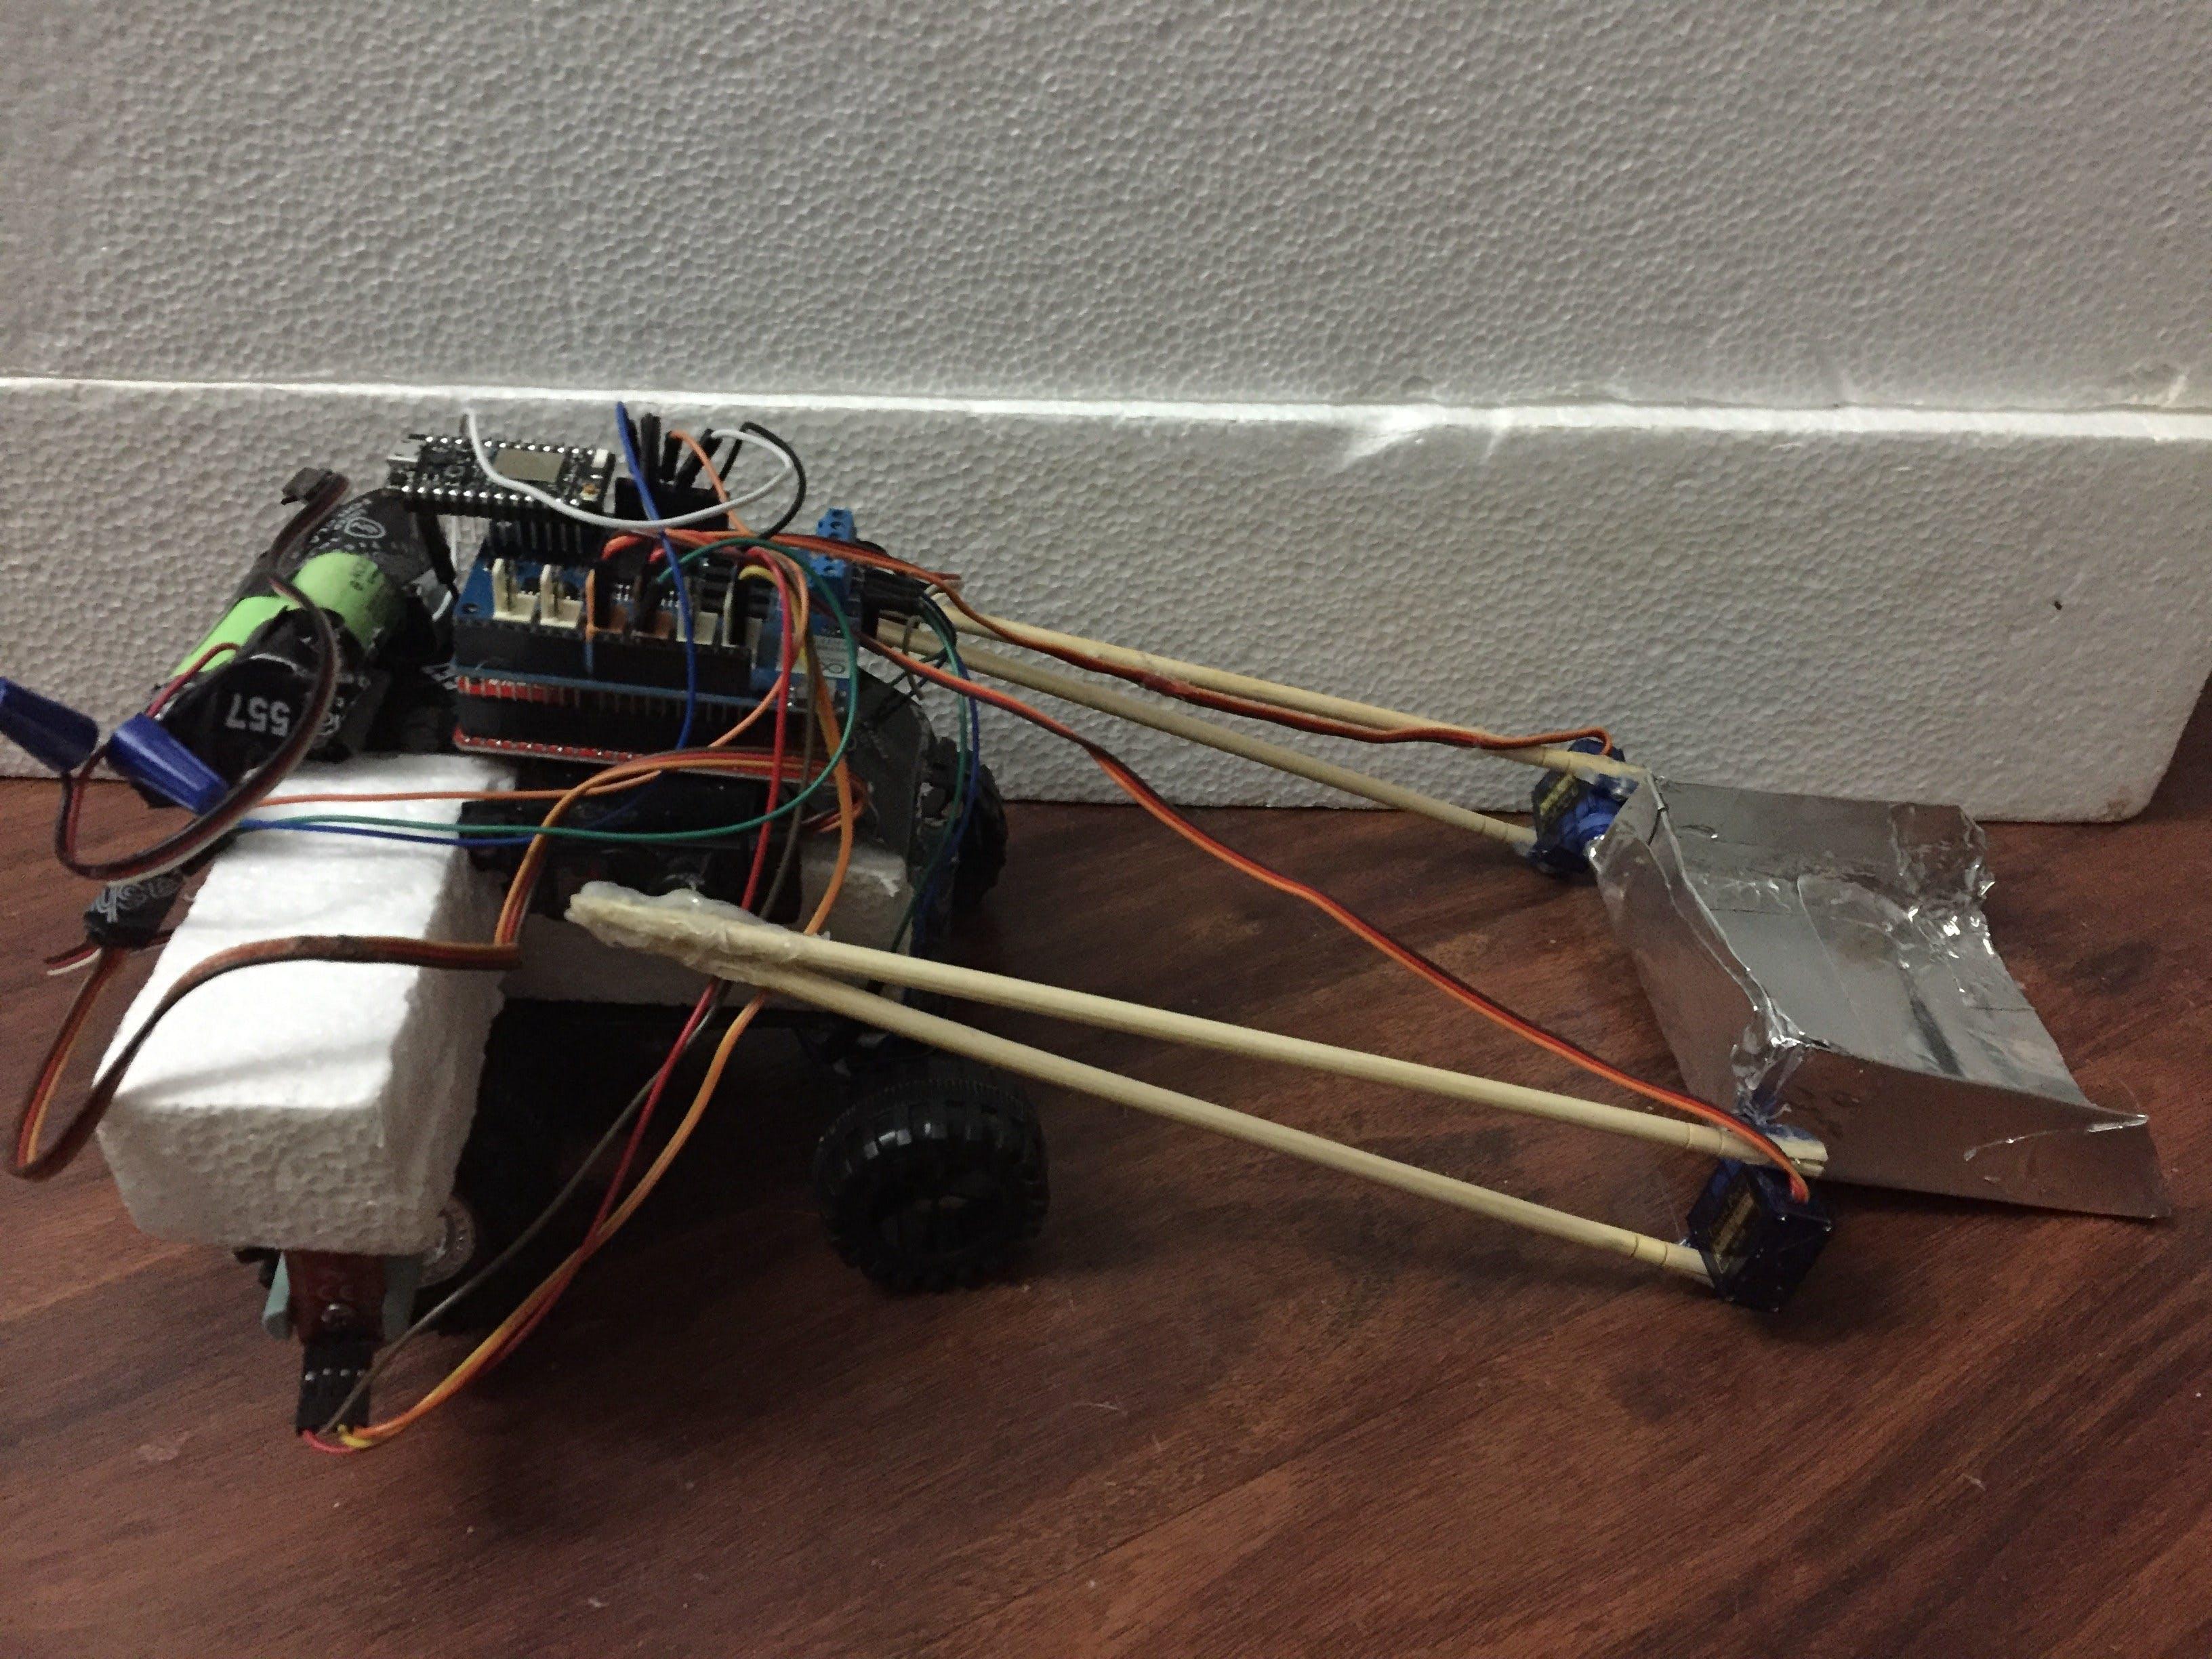 Autonomous Yard Scooping Entity